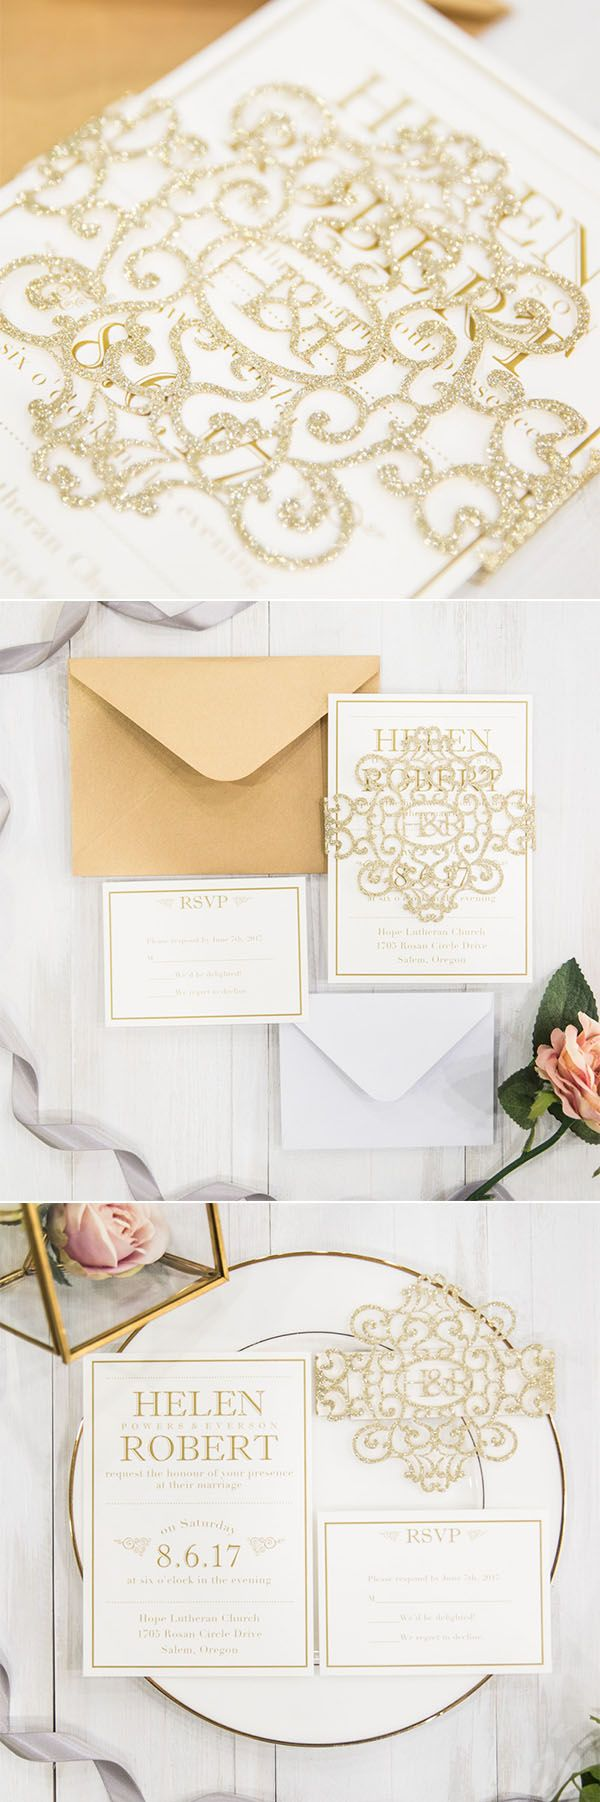 81 best gold foil wedding invitations images on pinterest